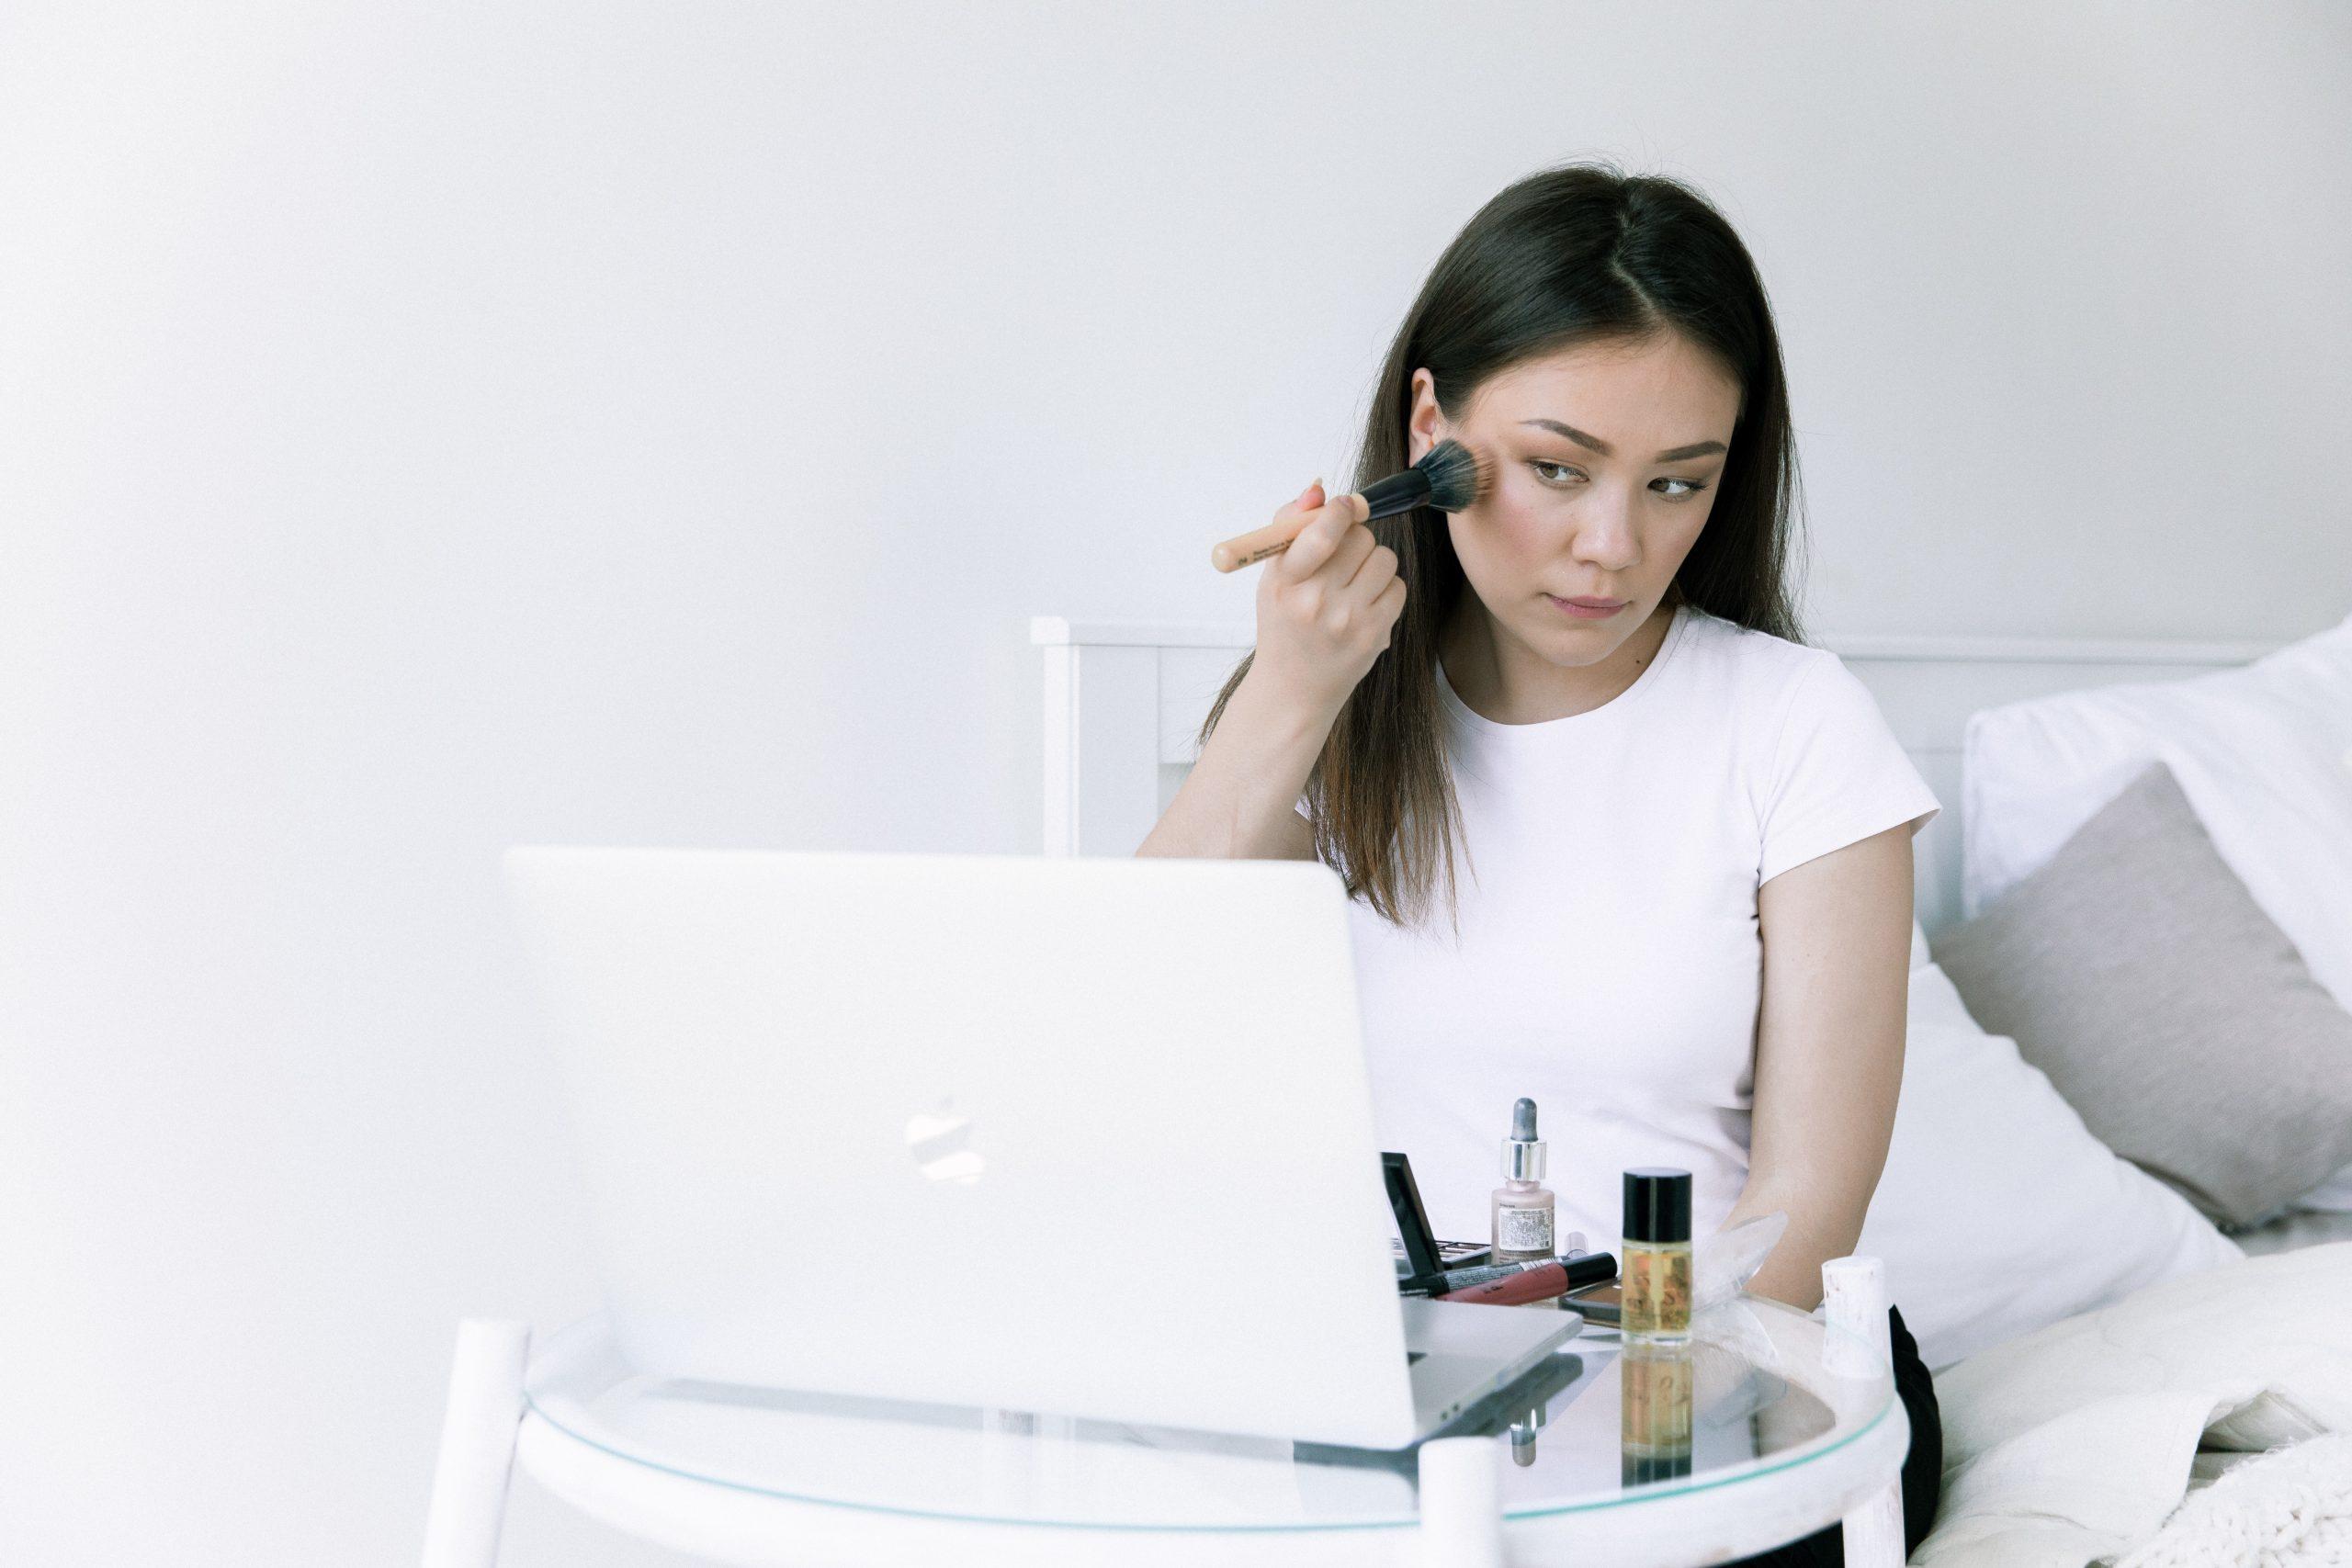 Mujer asiática maquillandose